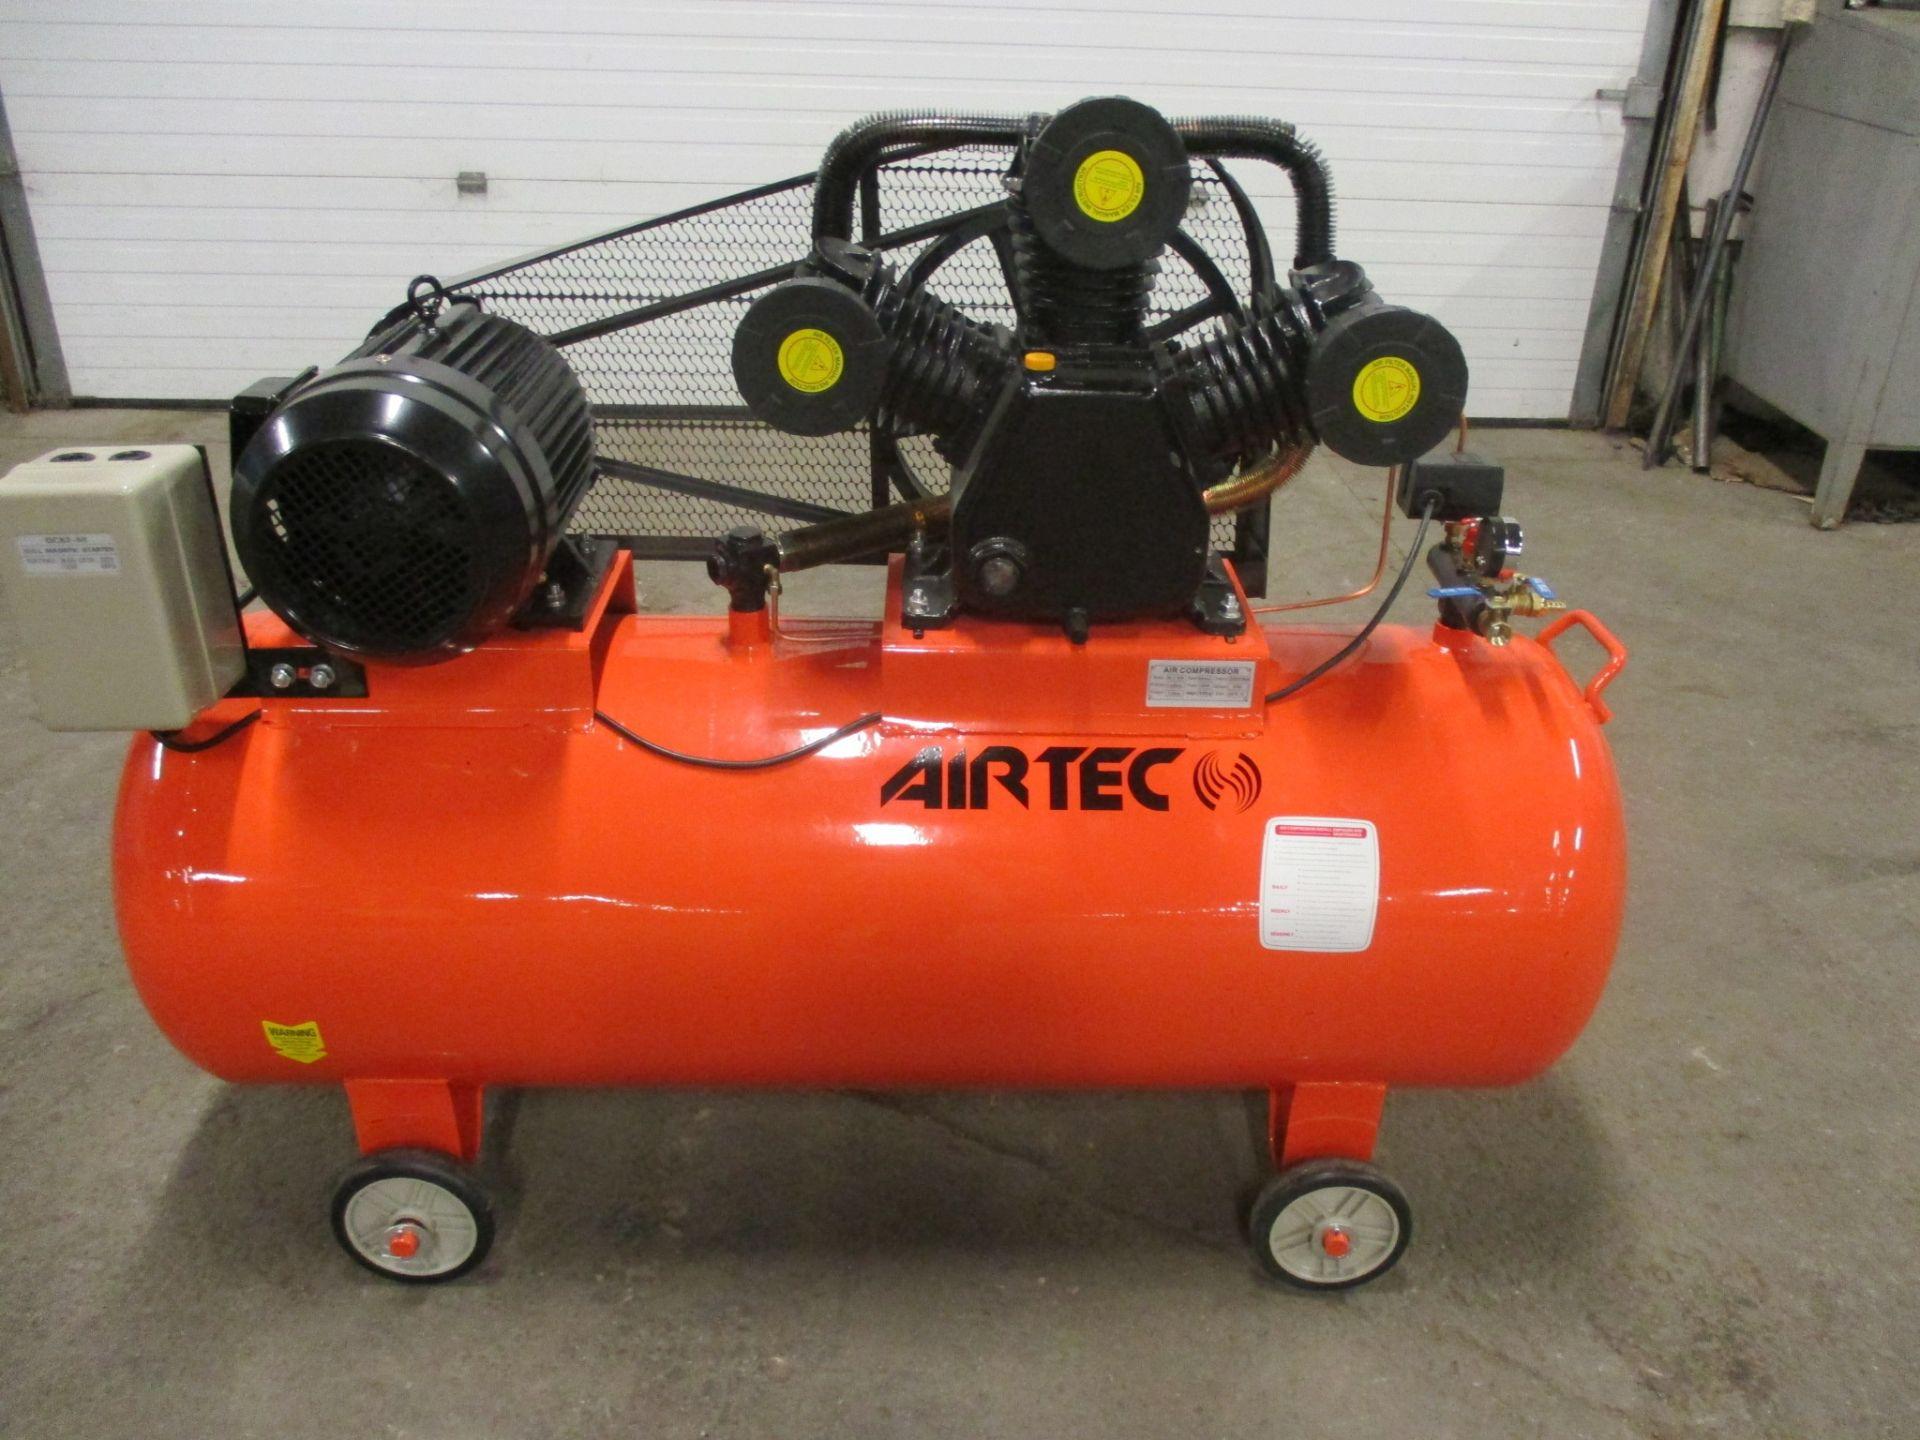 Airtec 10HP Air Compressor - MINT UNUSED COMPRESSOR with 80 Gallon horizontal compressed air